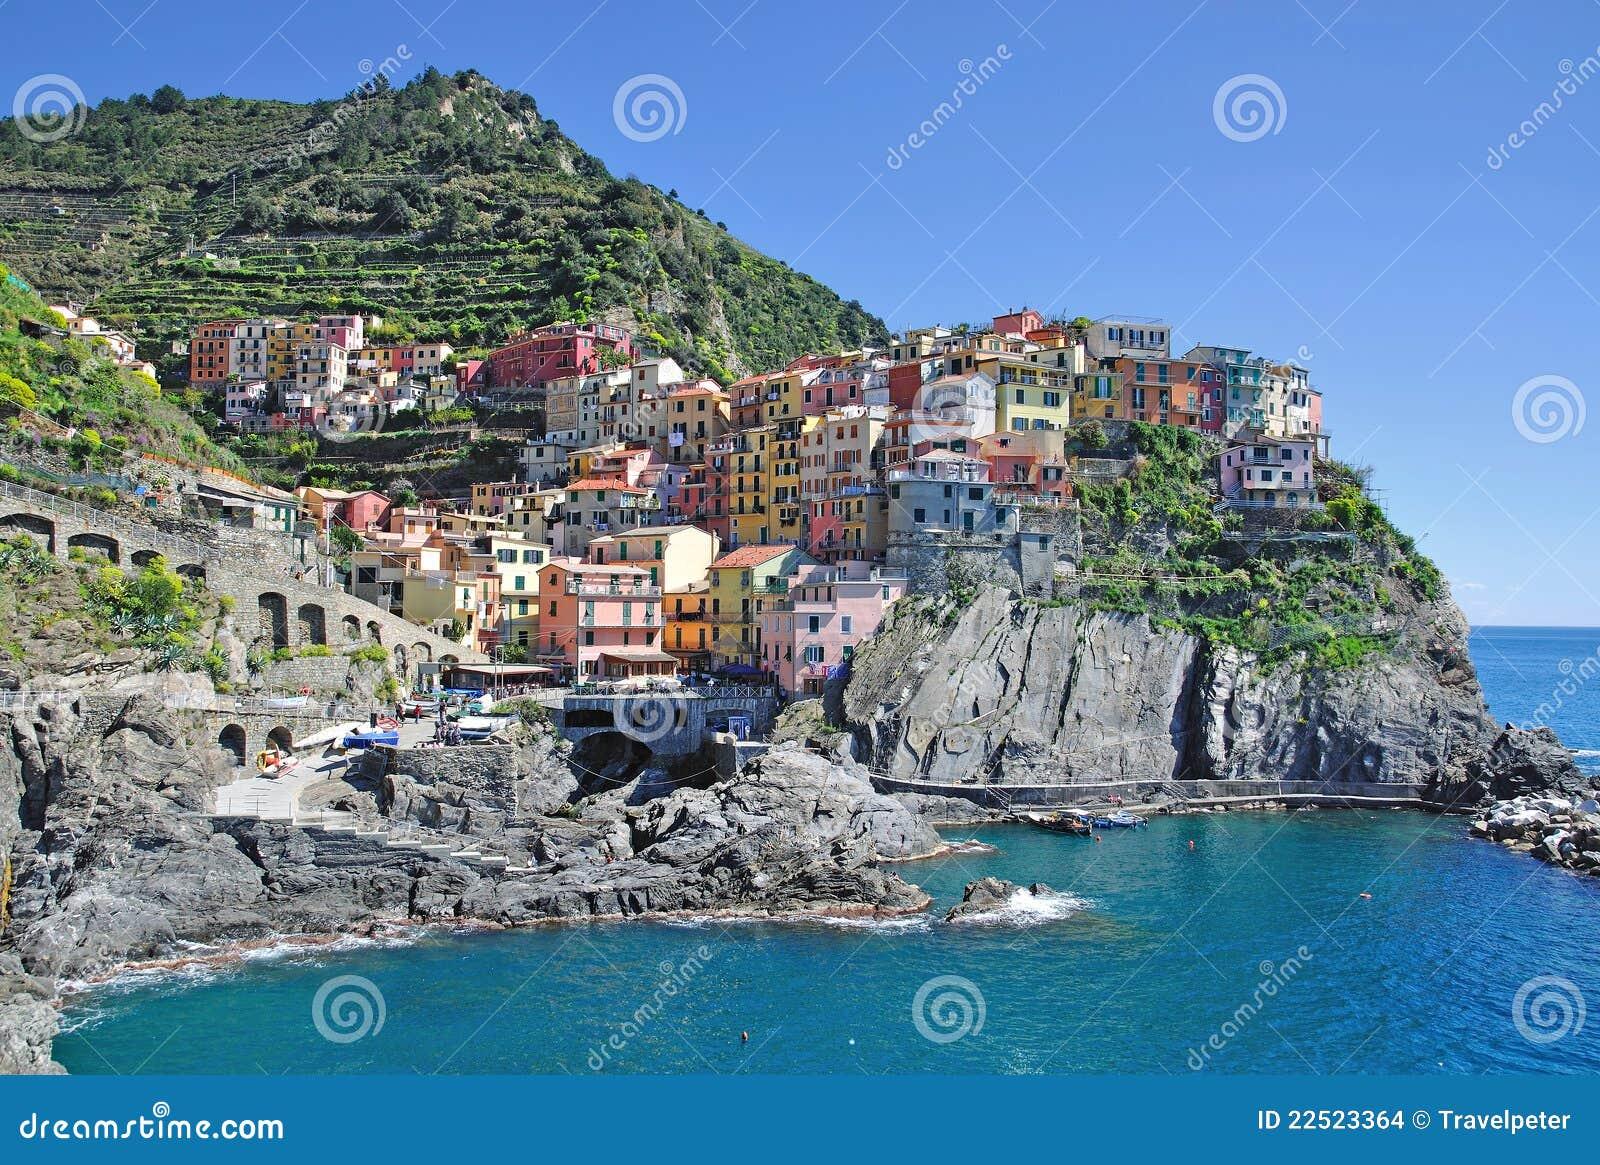 manarola cinque terre ligurie italie photo stock image du vacances m diterran en 22523364. Black Bedroom Furniture Sets. Home Design Ideas